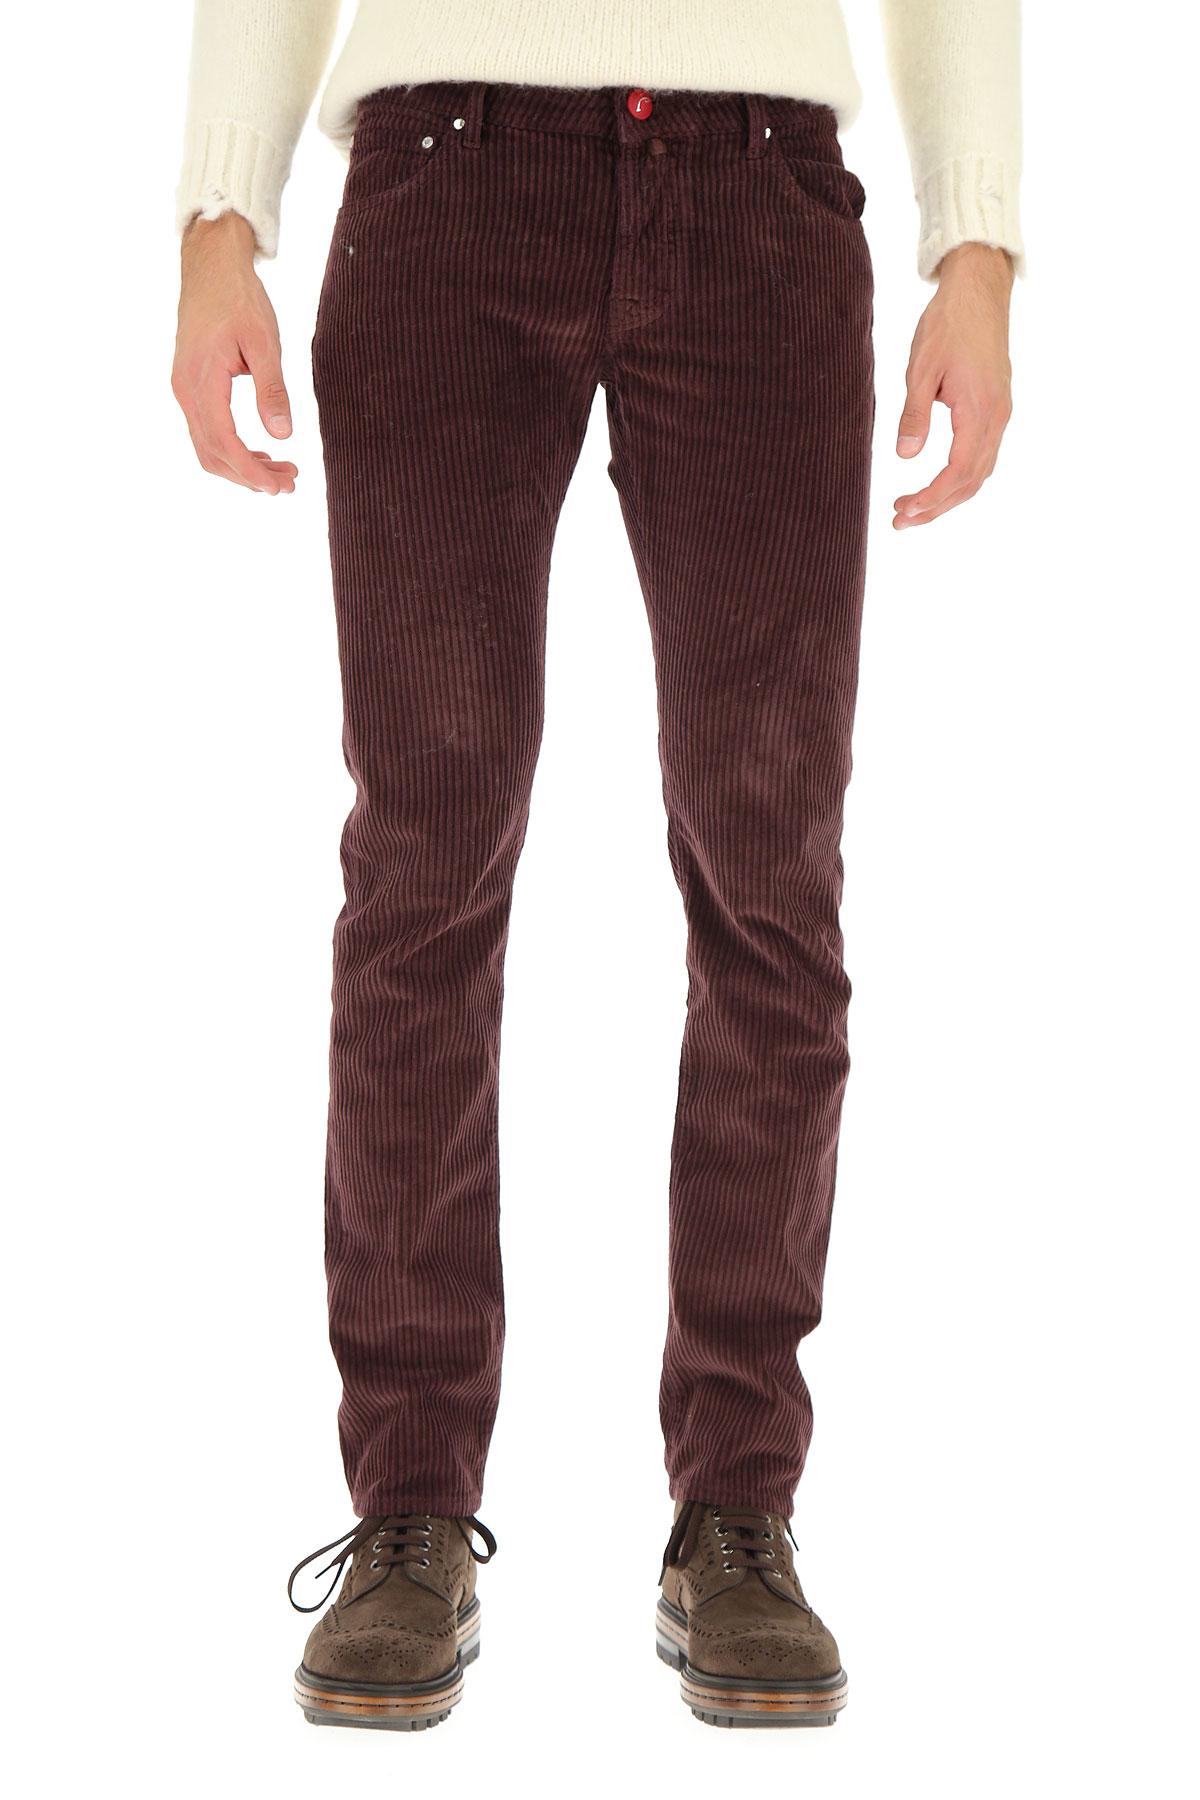 Jacob Cohen Jeans On Sale, dark Burgundy, Cotton, 2019, 30 31 32 33 34 36 38